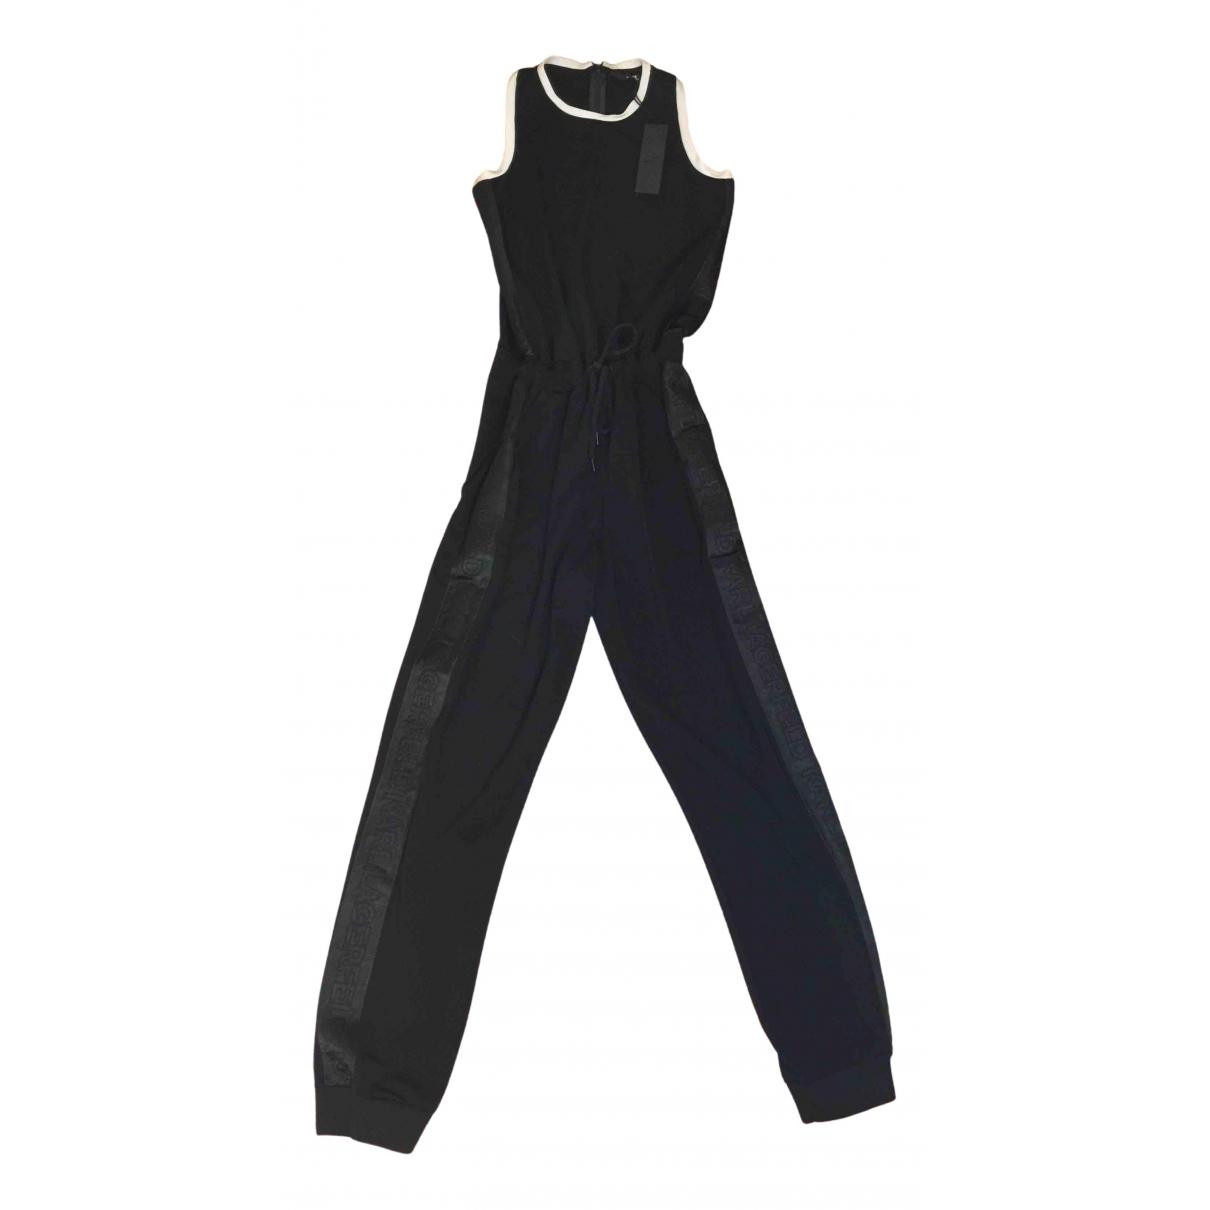 Karl Lagerfeld N Black jumpsuit for Women M International